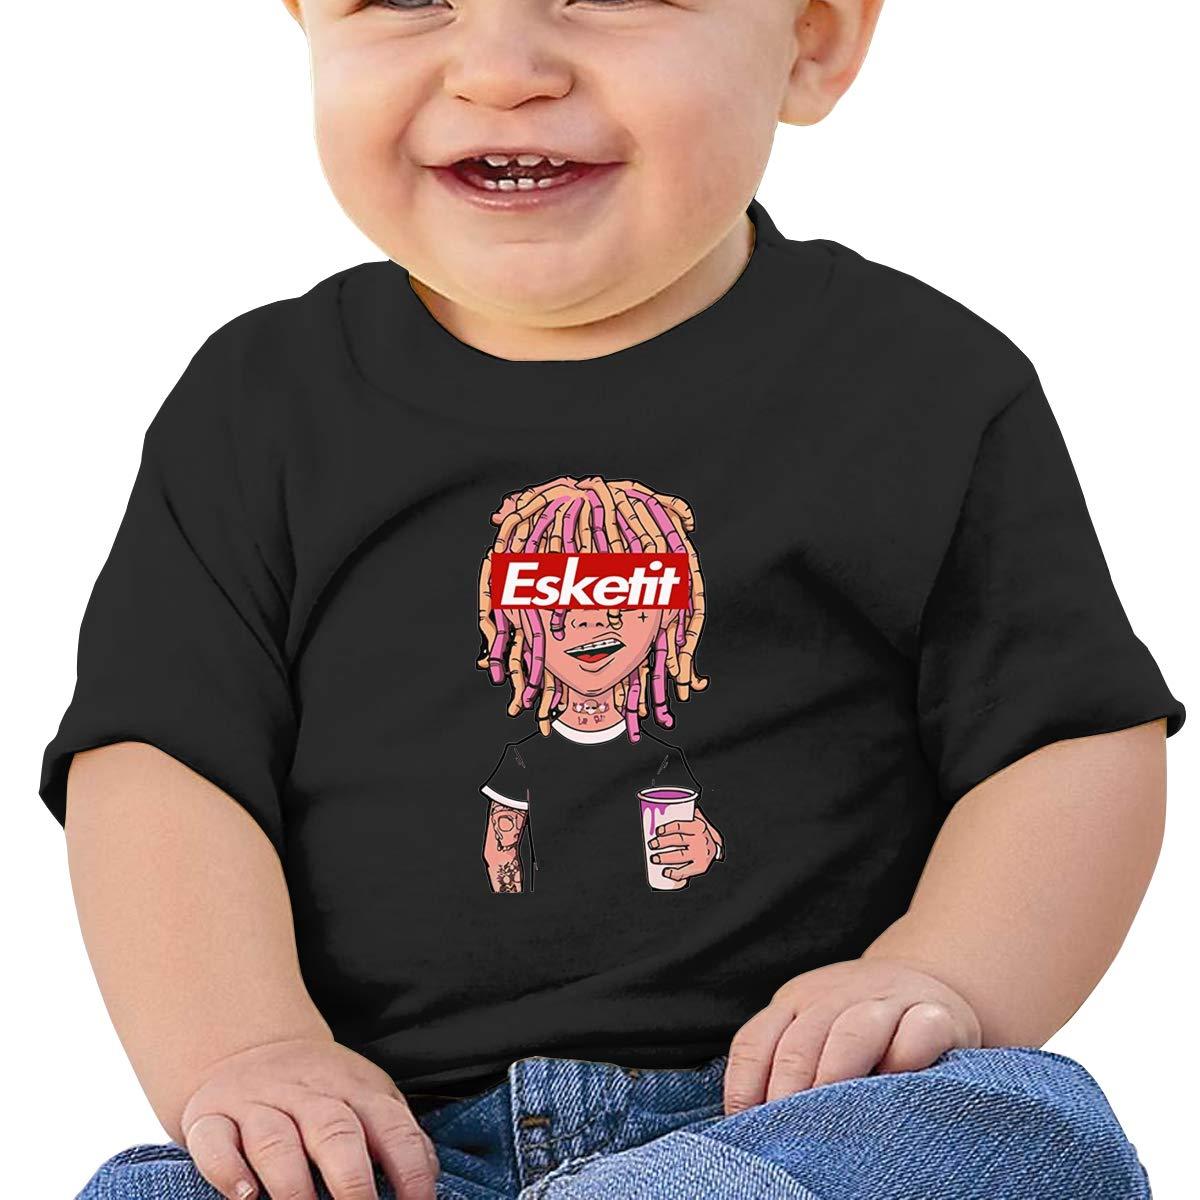 Baby Lil Pump ESKETIT PEEP Uzi Shirt Childrens Cotton Tee